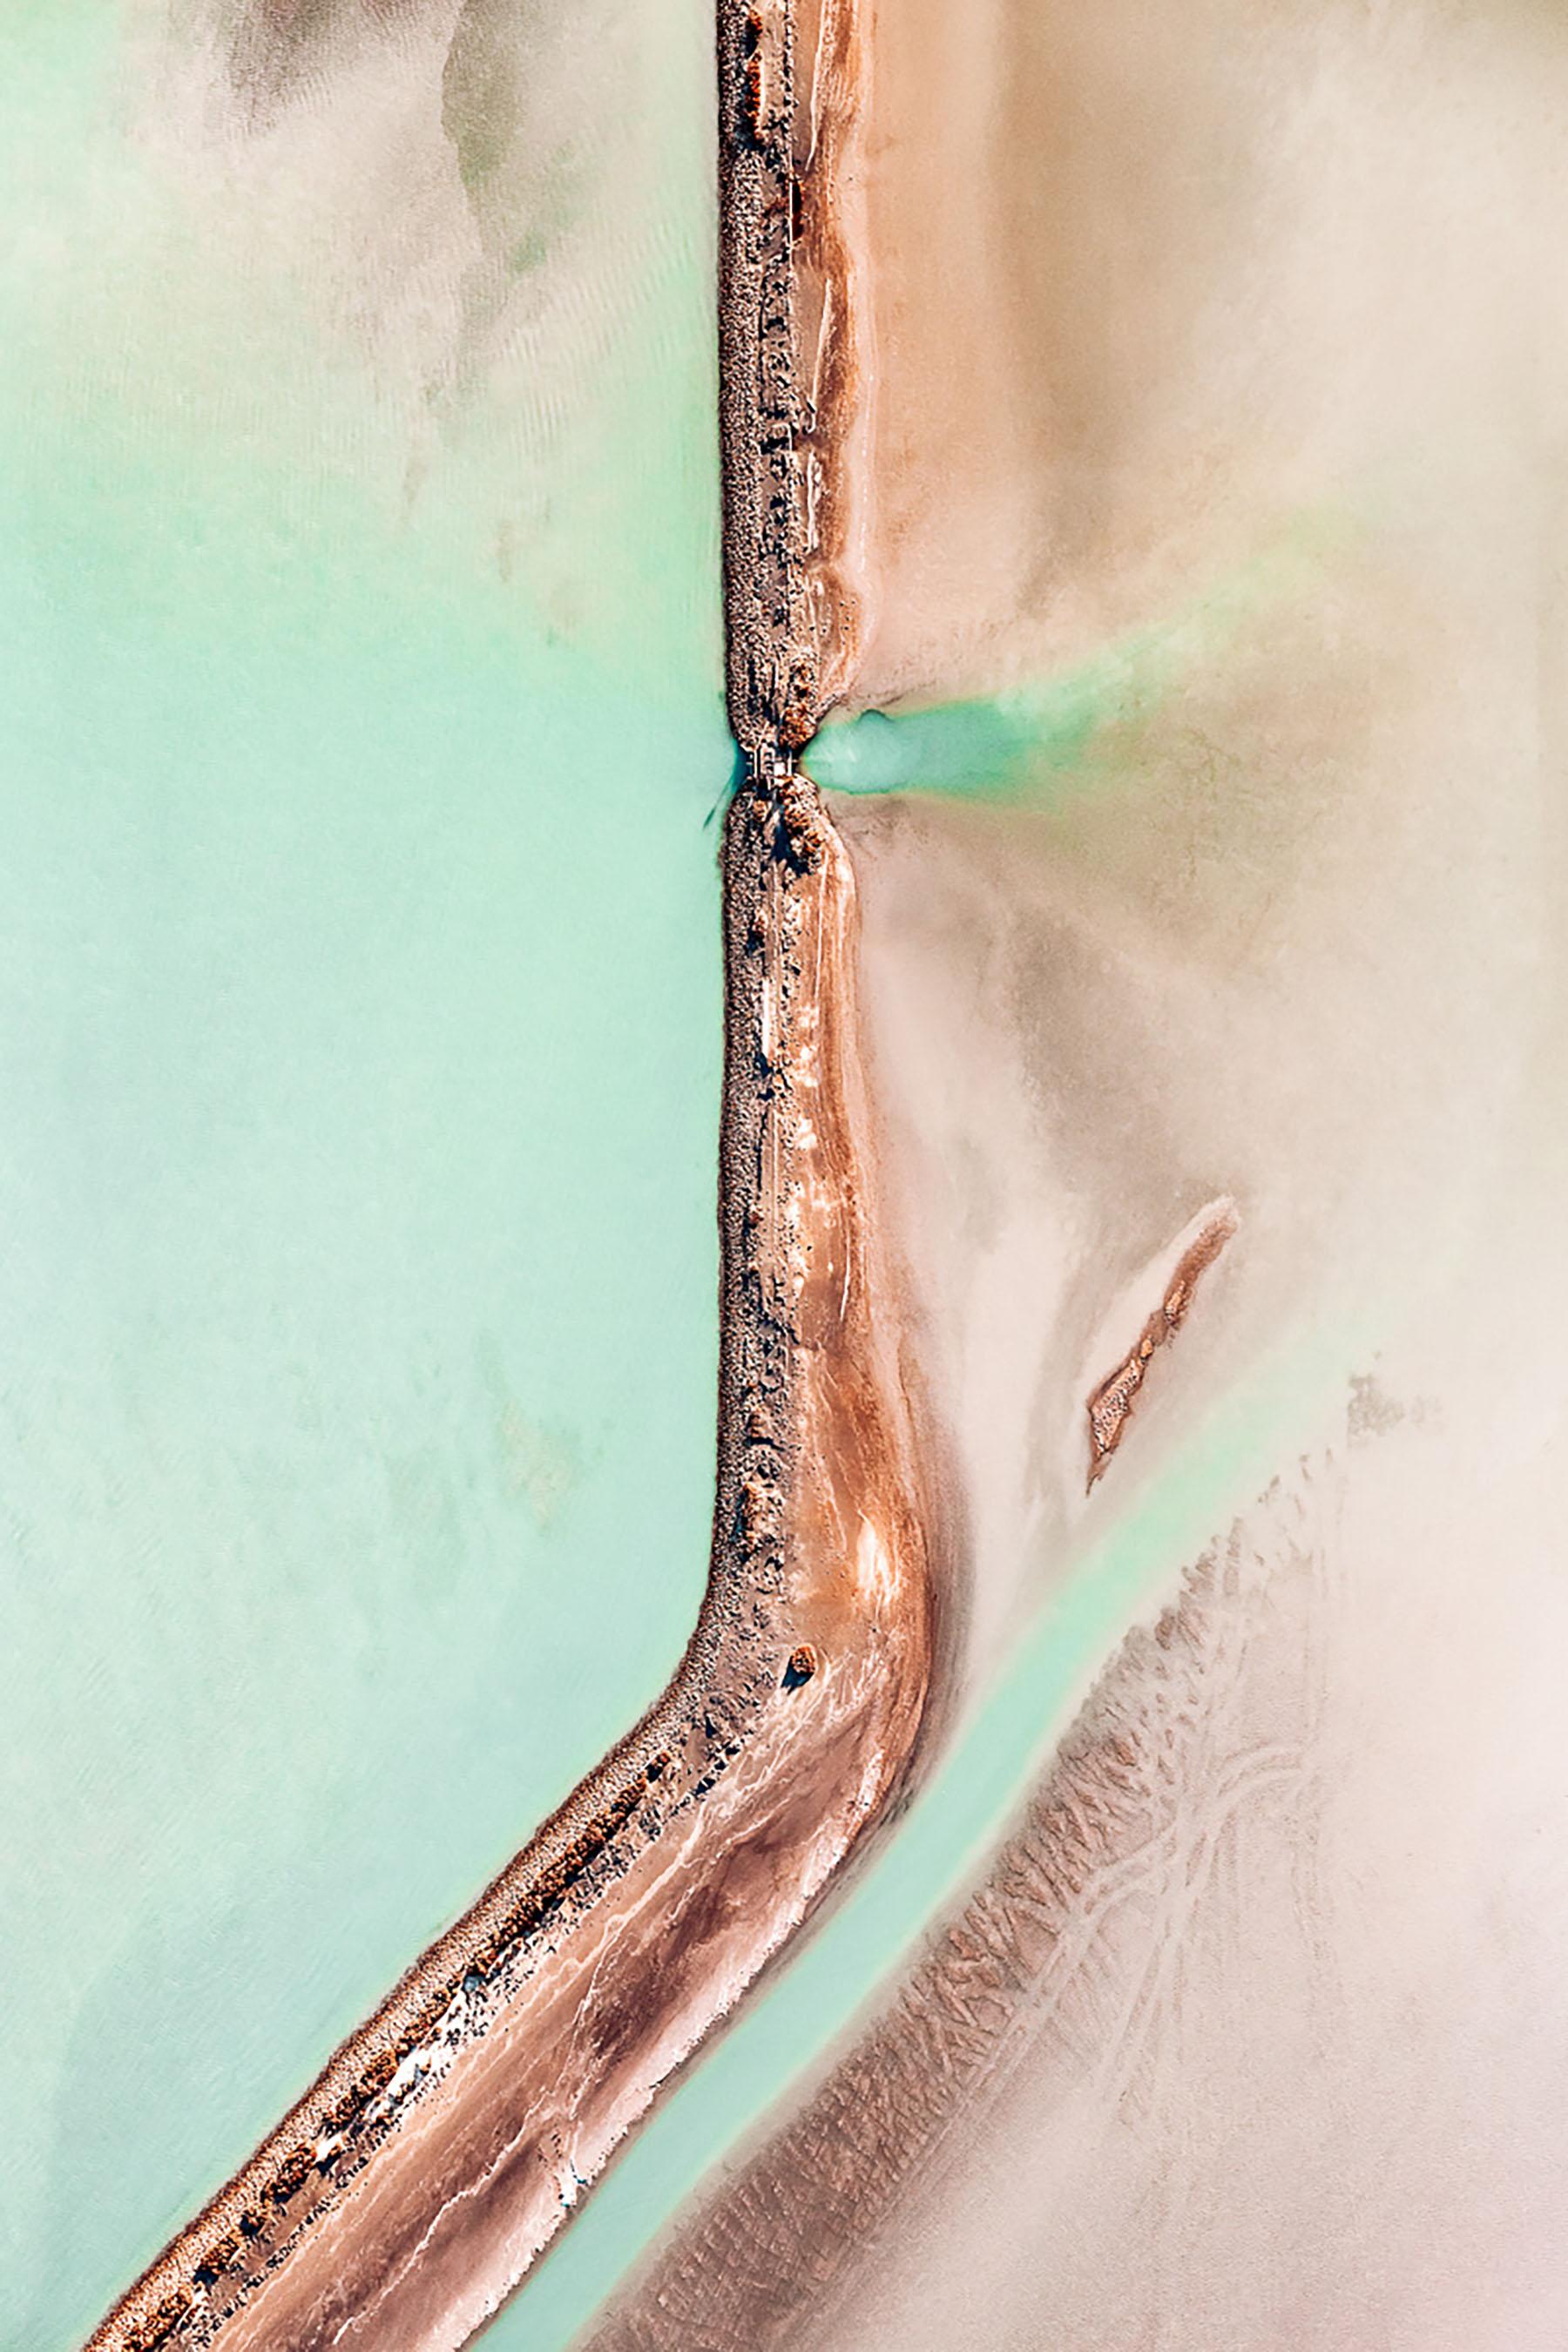 iGNANT-Photography-Tom-Hegen-The-Salt-Series-004